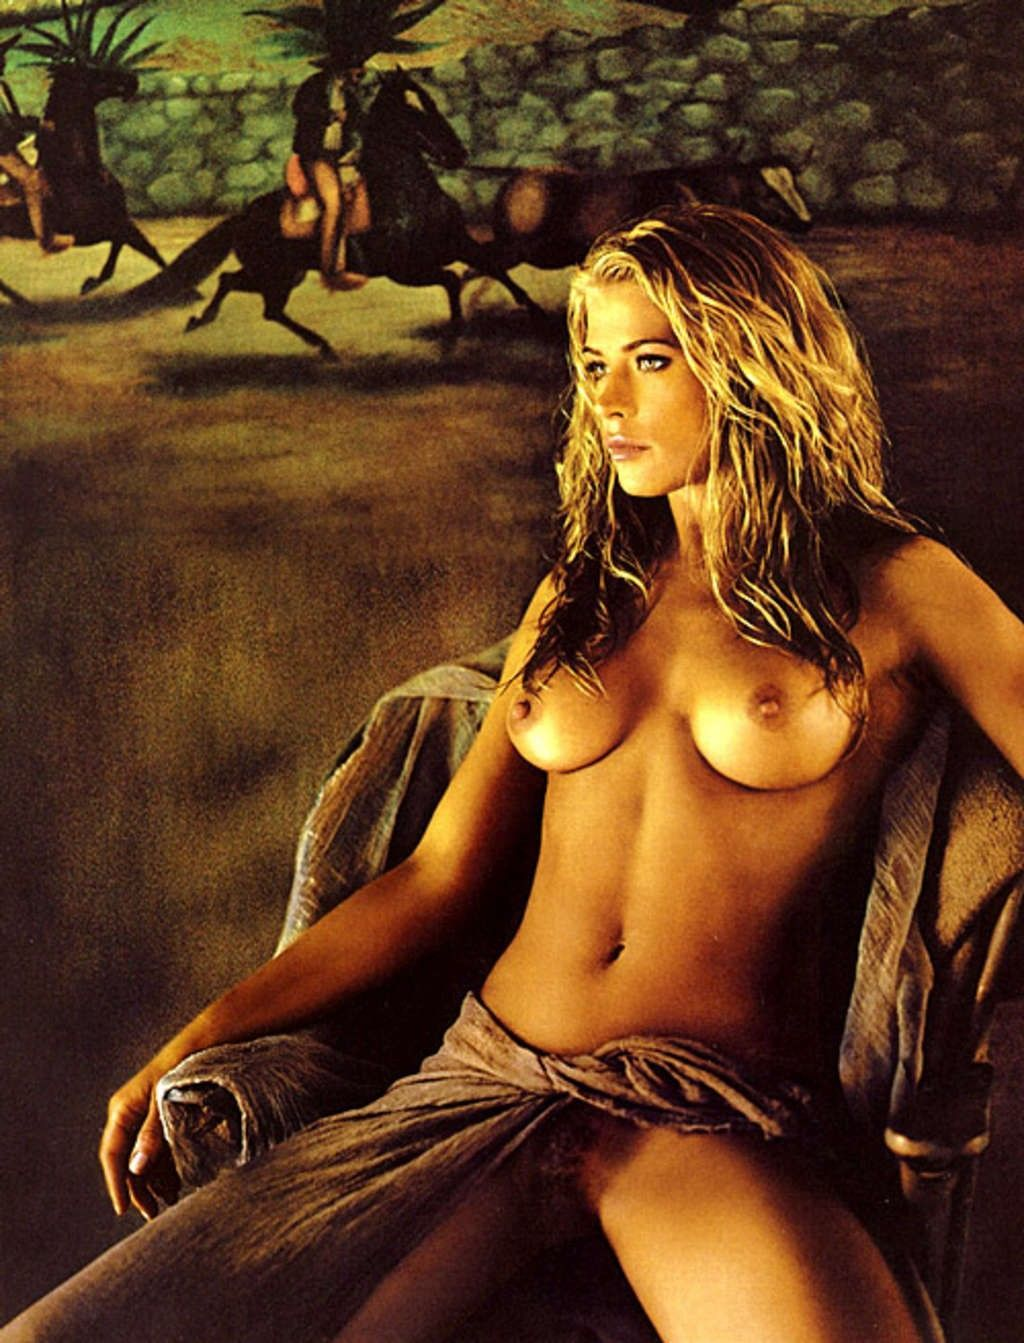 Kristen Johnston Topless